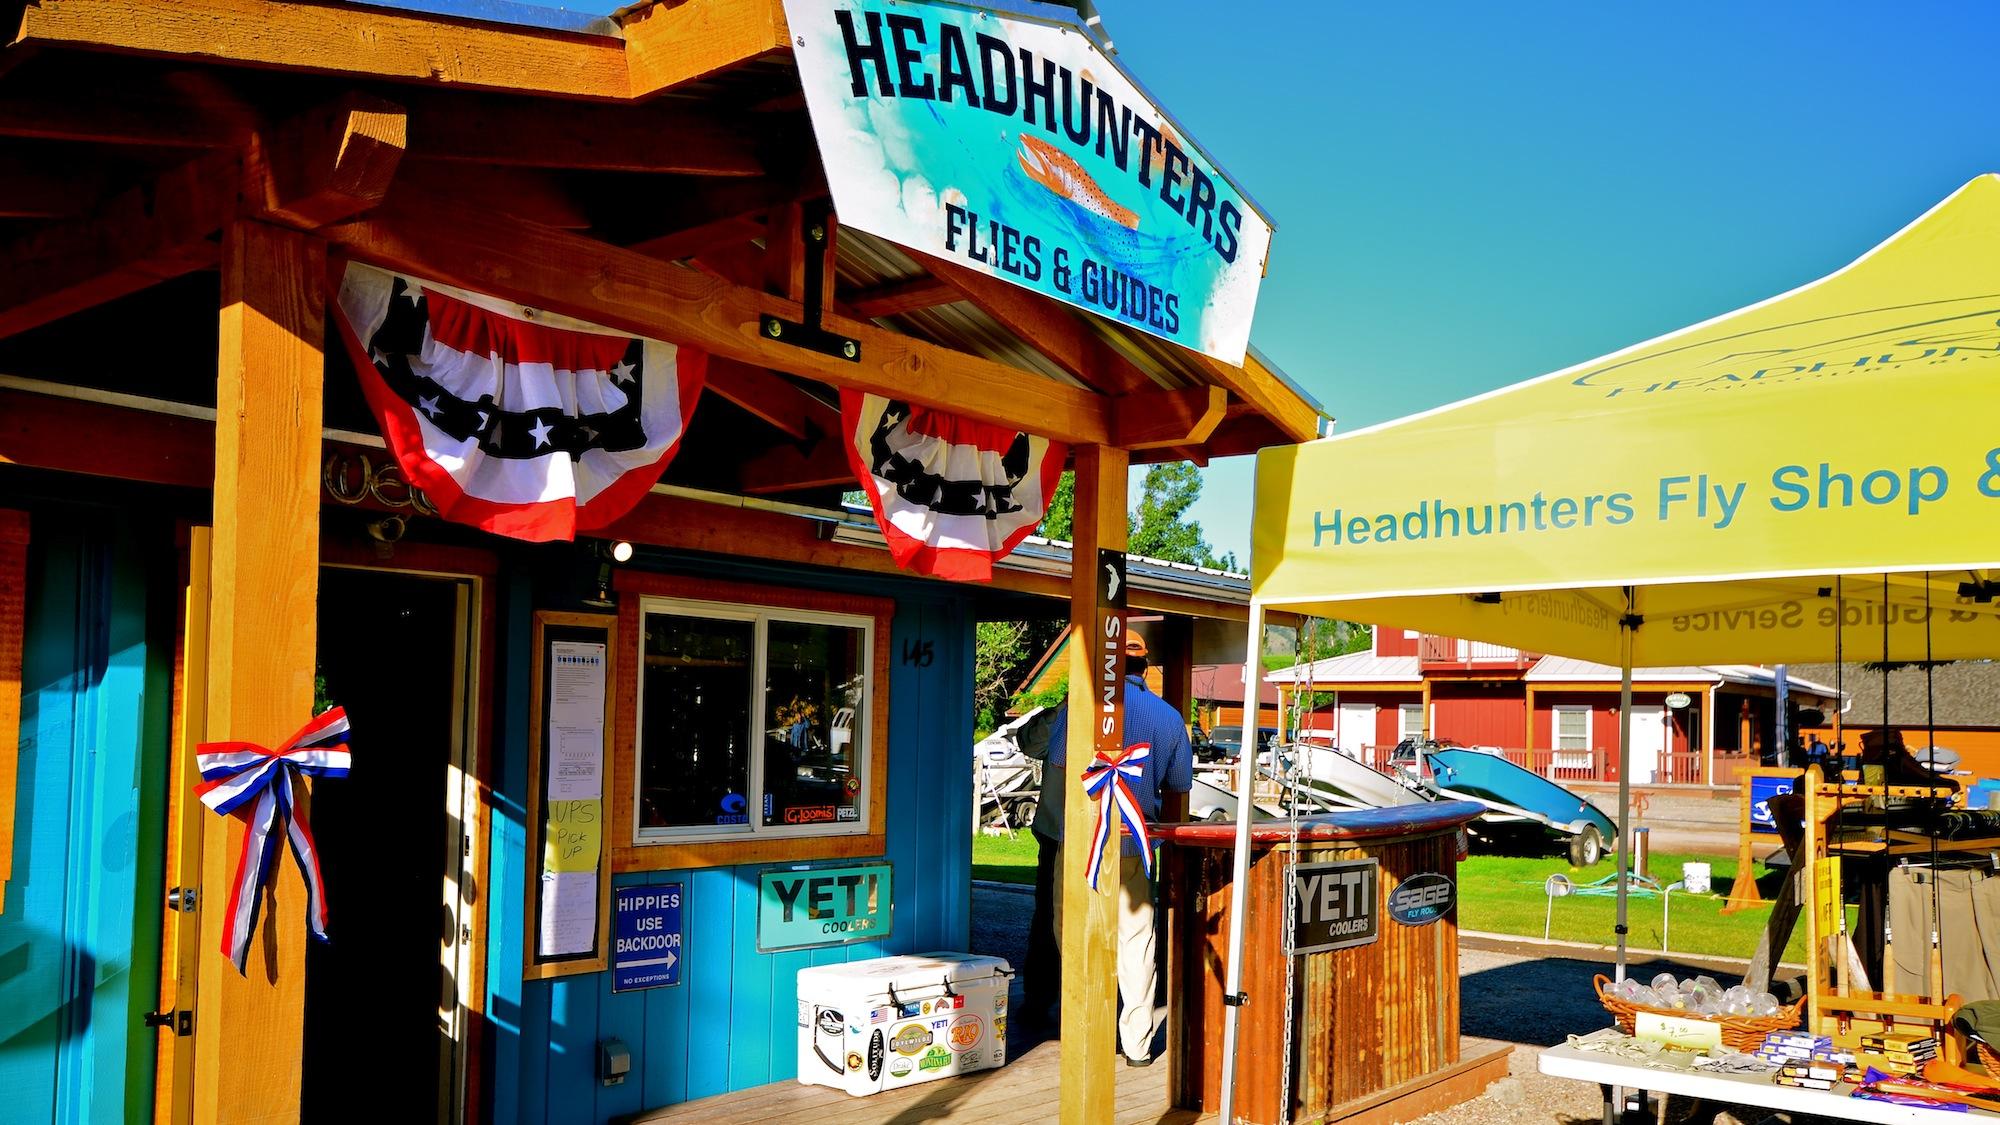 Headhunters 4th of July Celebration